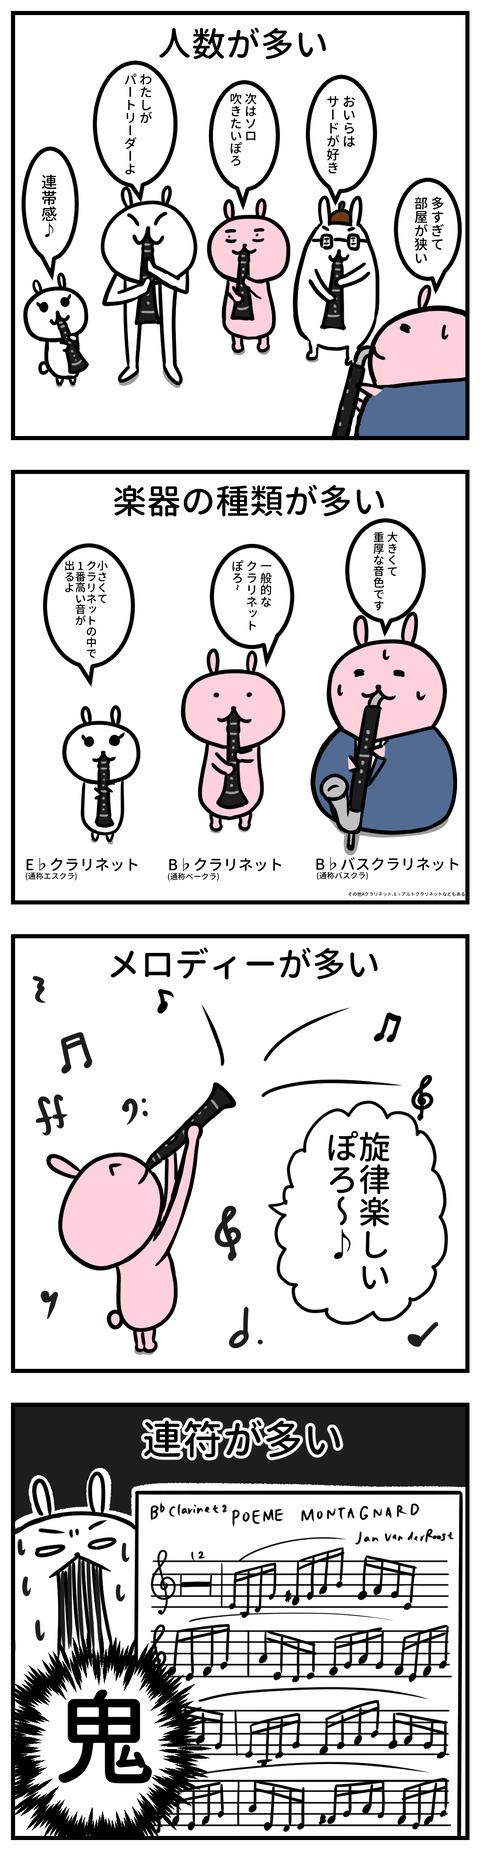 manga-yuzuporo36-1